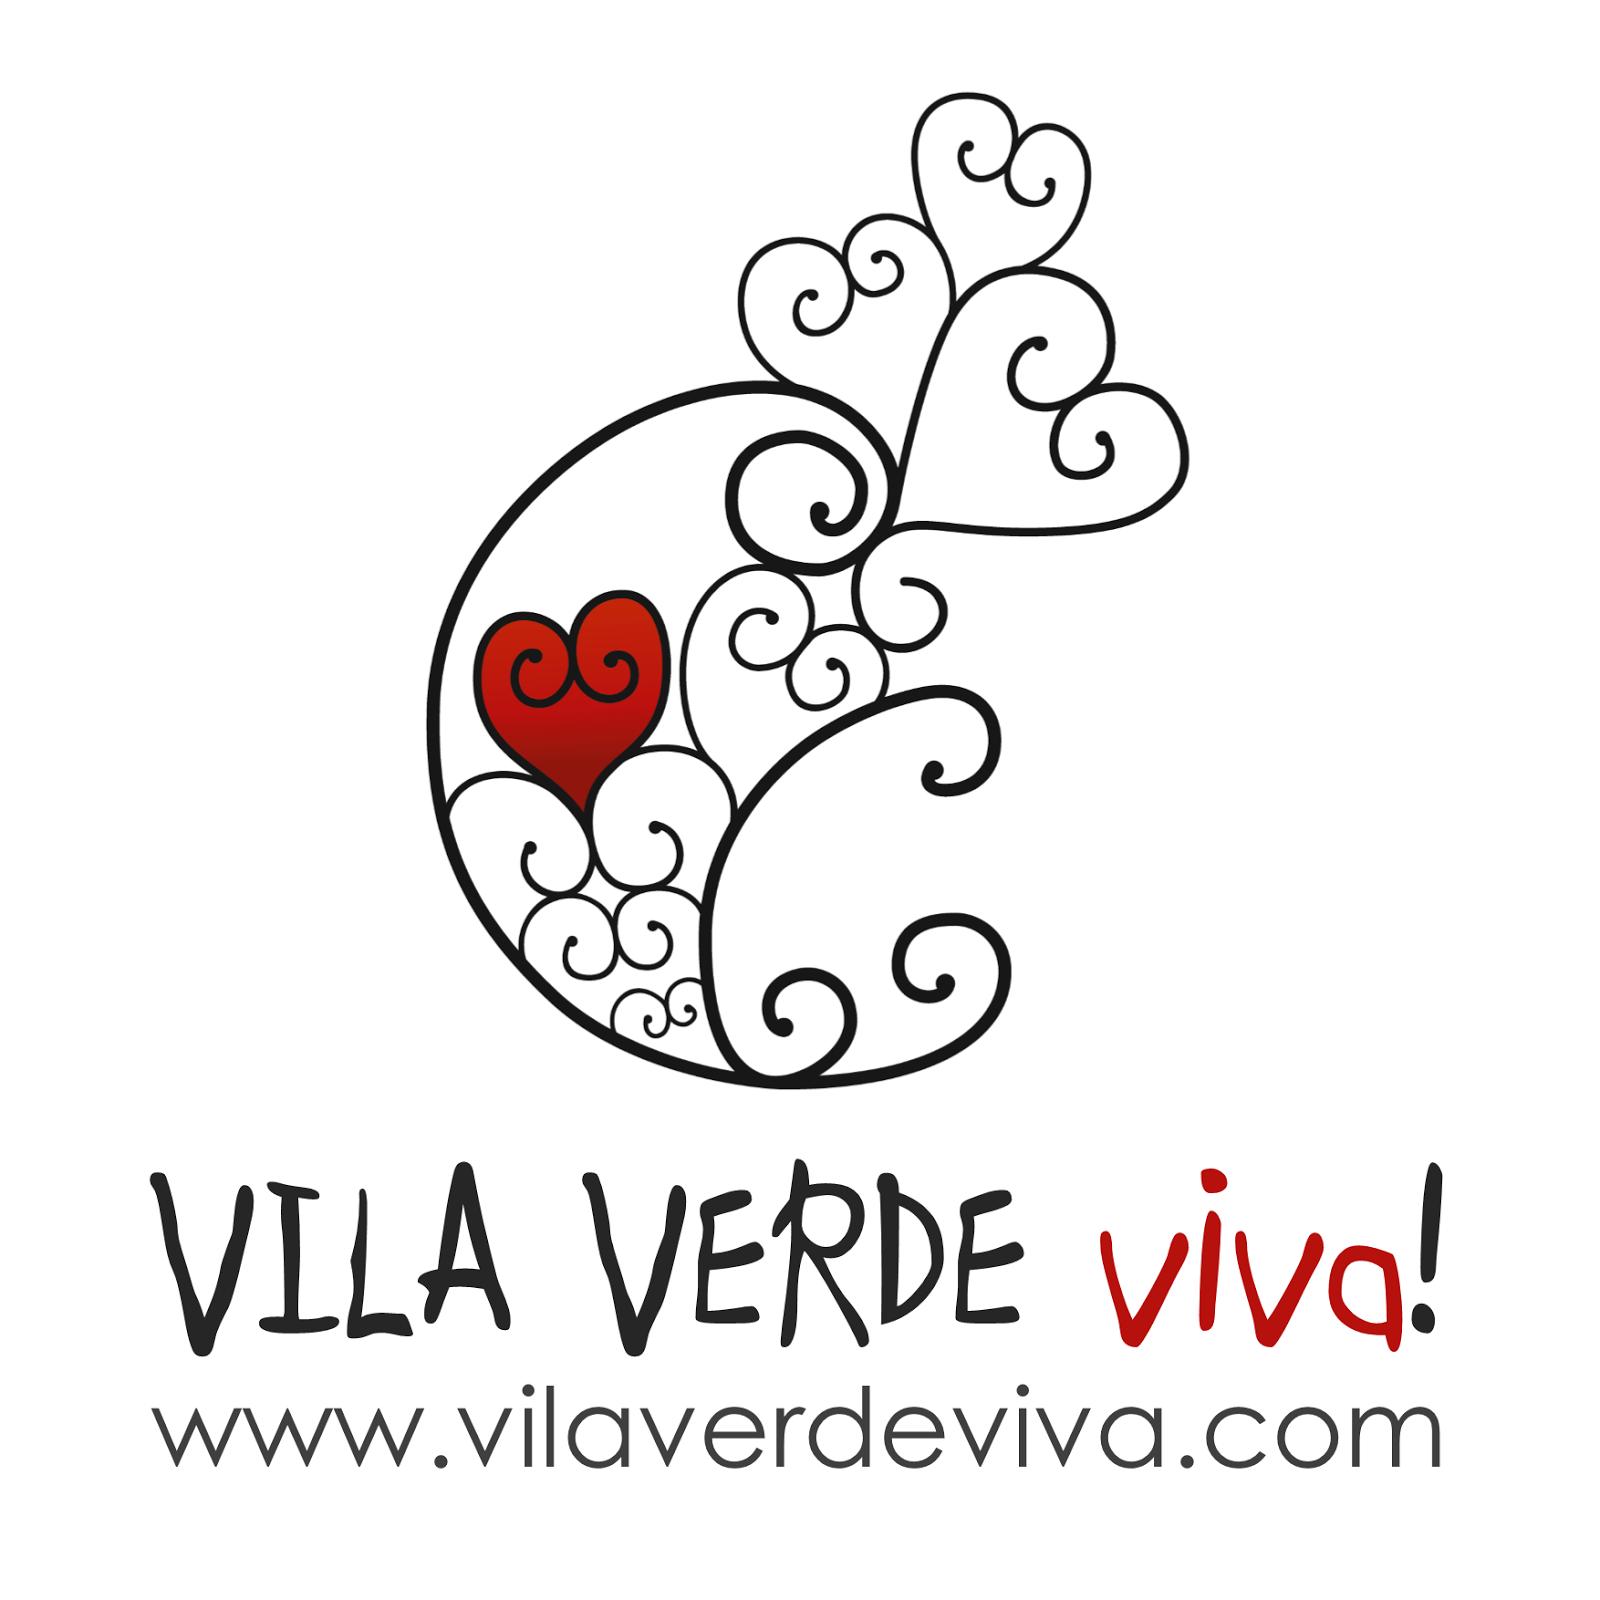 & VILA VERDE viva!